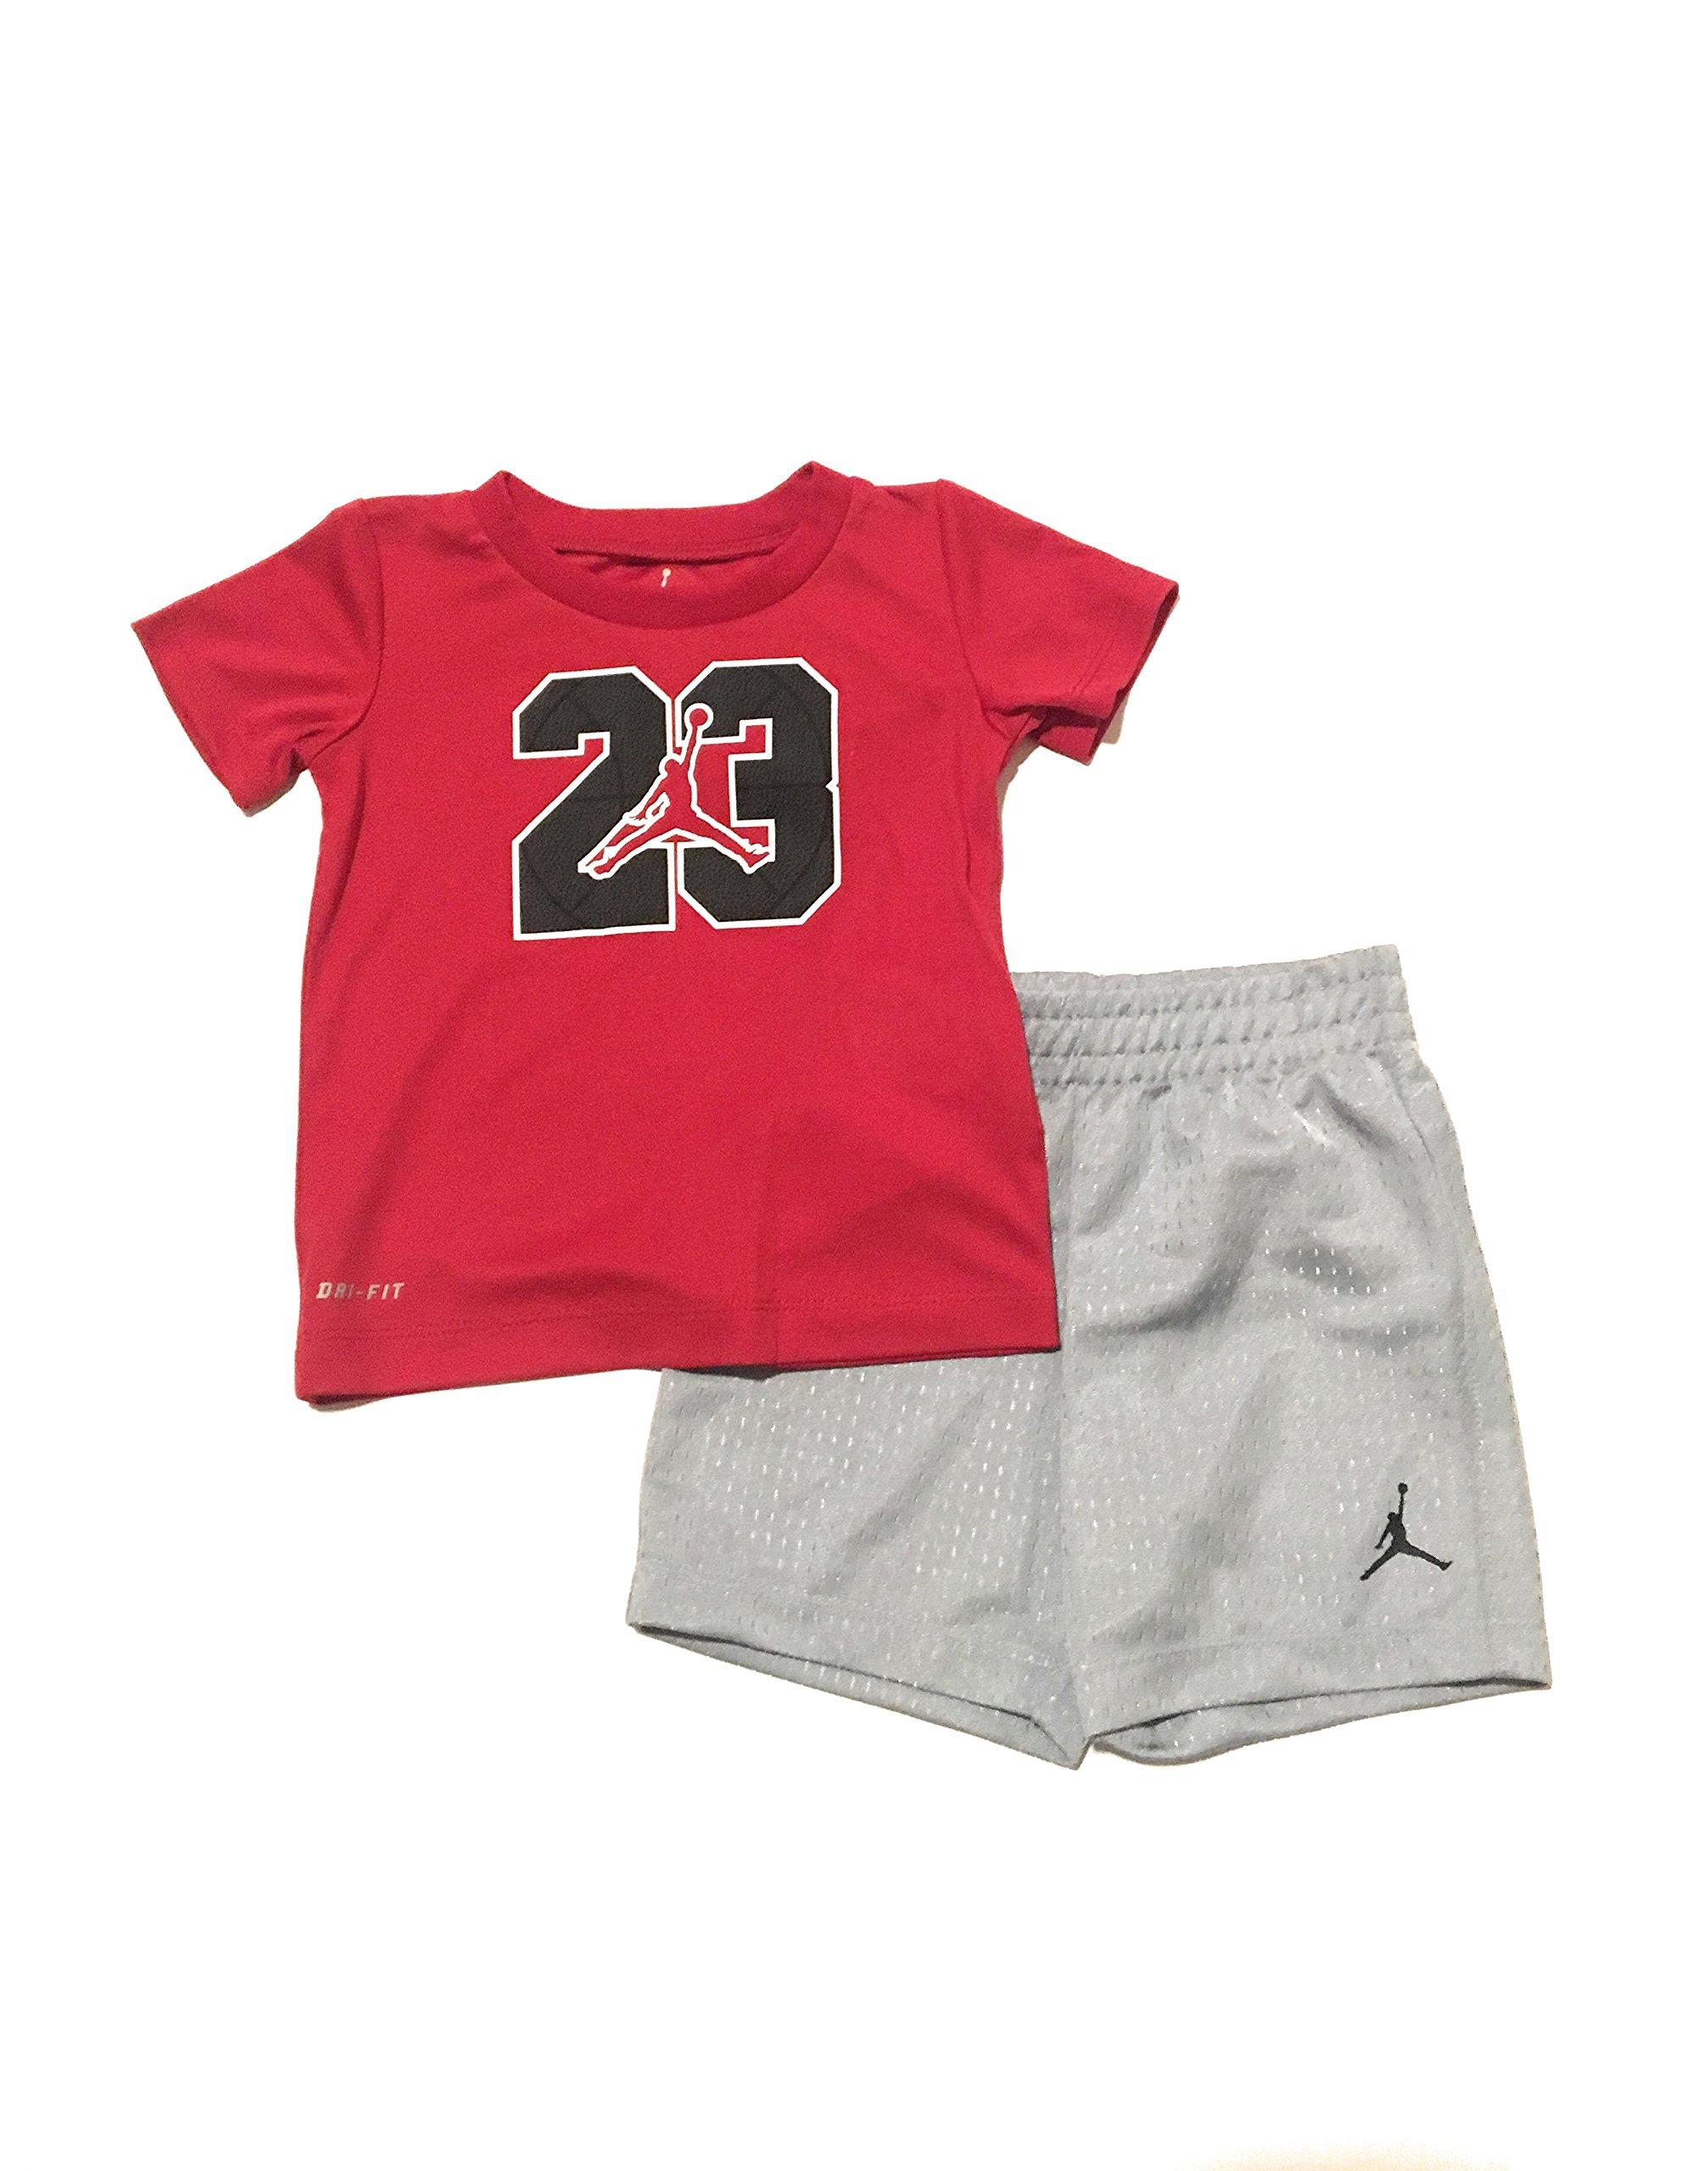 Jordan Jumpman Infant Boys T-Shirt and Shorts Set Red/Wolf Grey Size 24 Months by Jordan